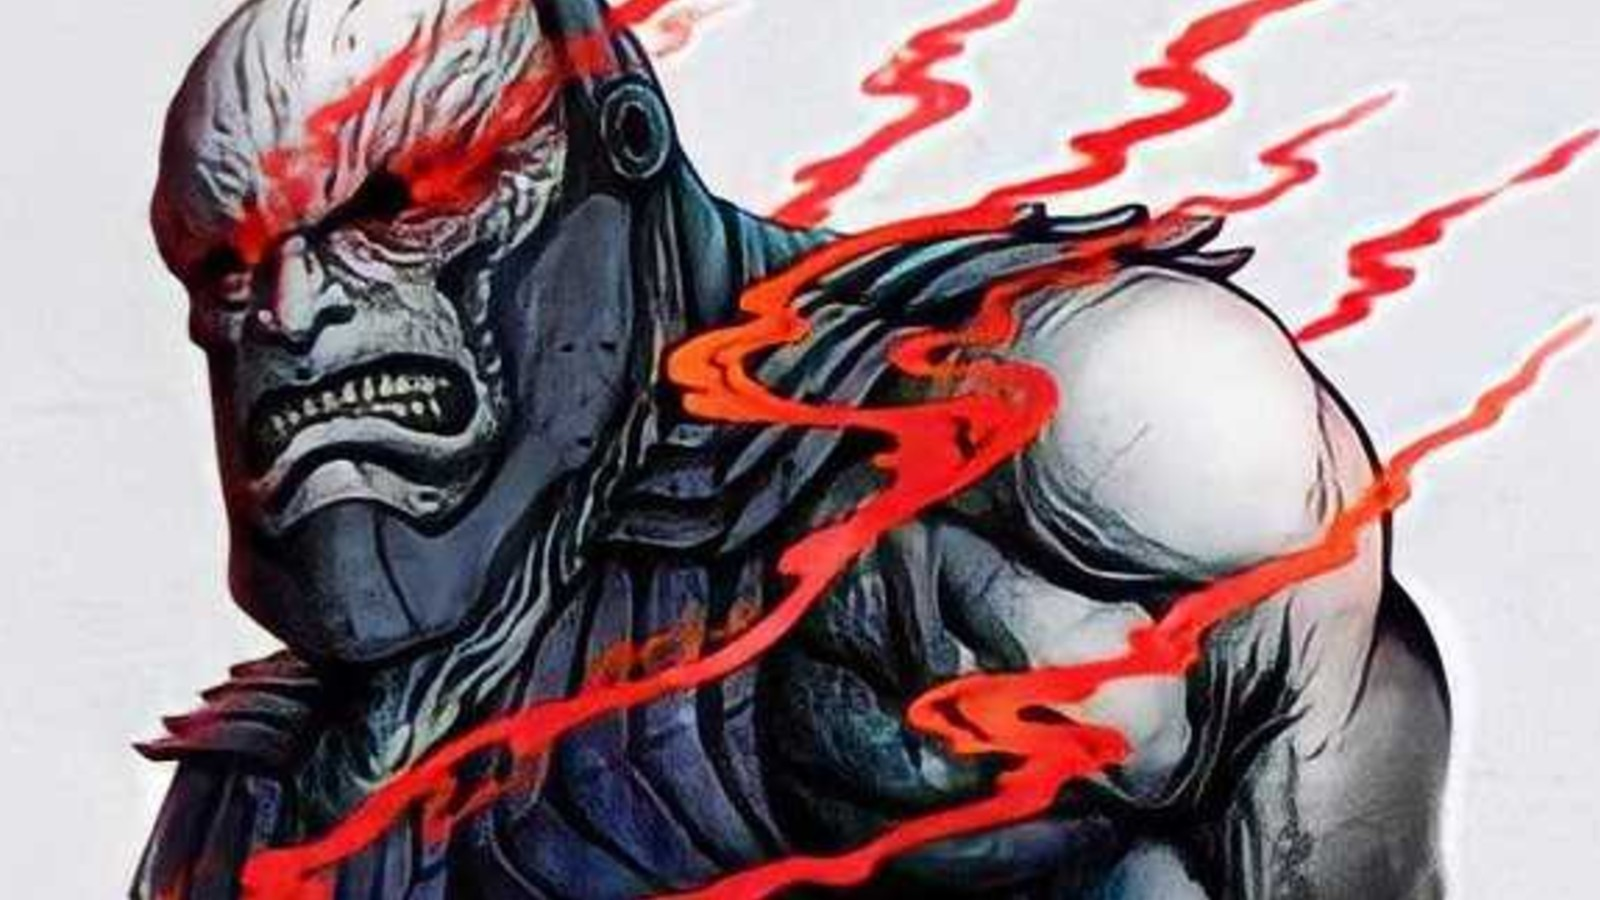 Zack snyder's Darkseid